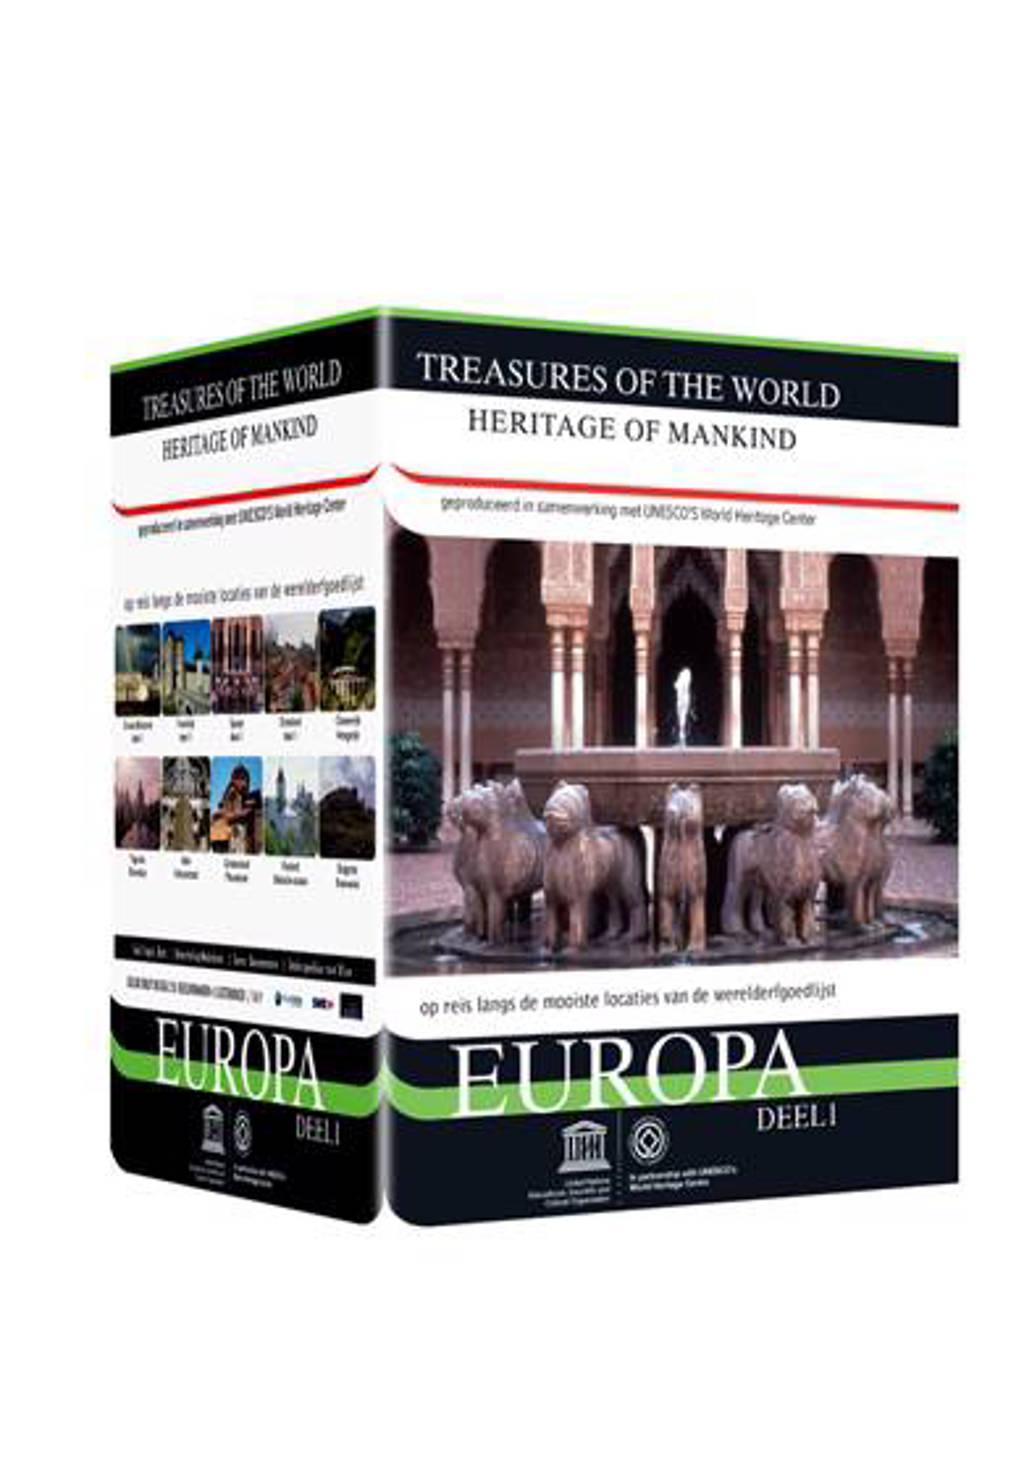 Treasures of the world - Europa 1 (DVD)